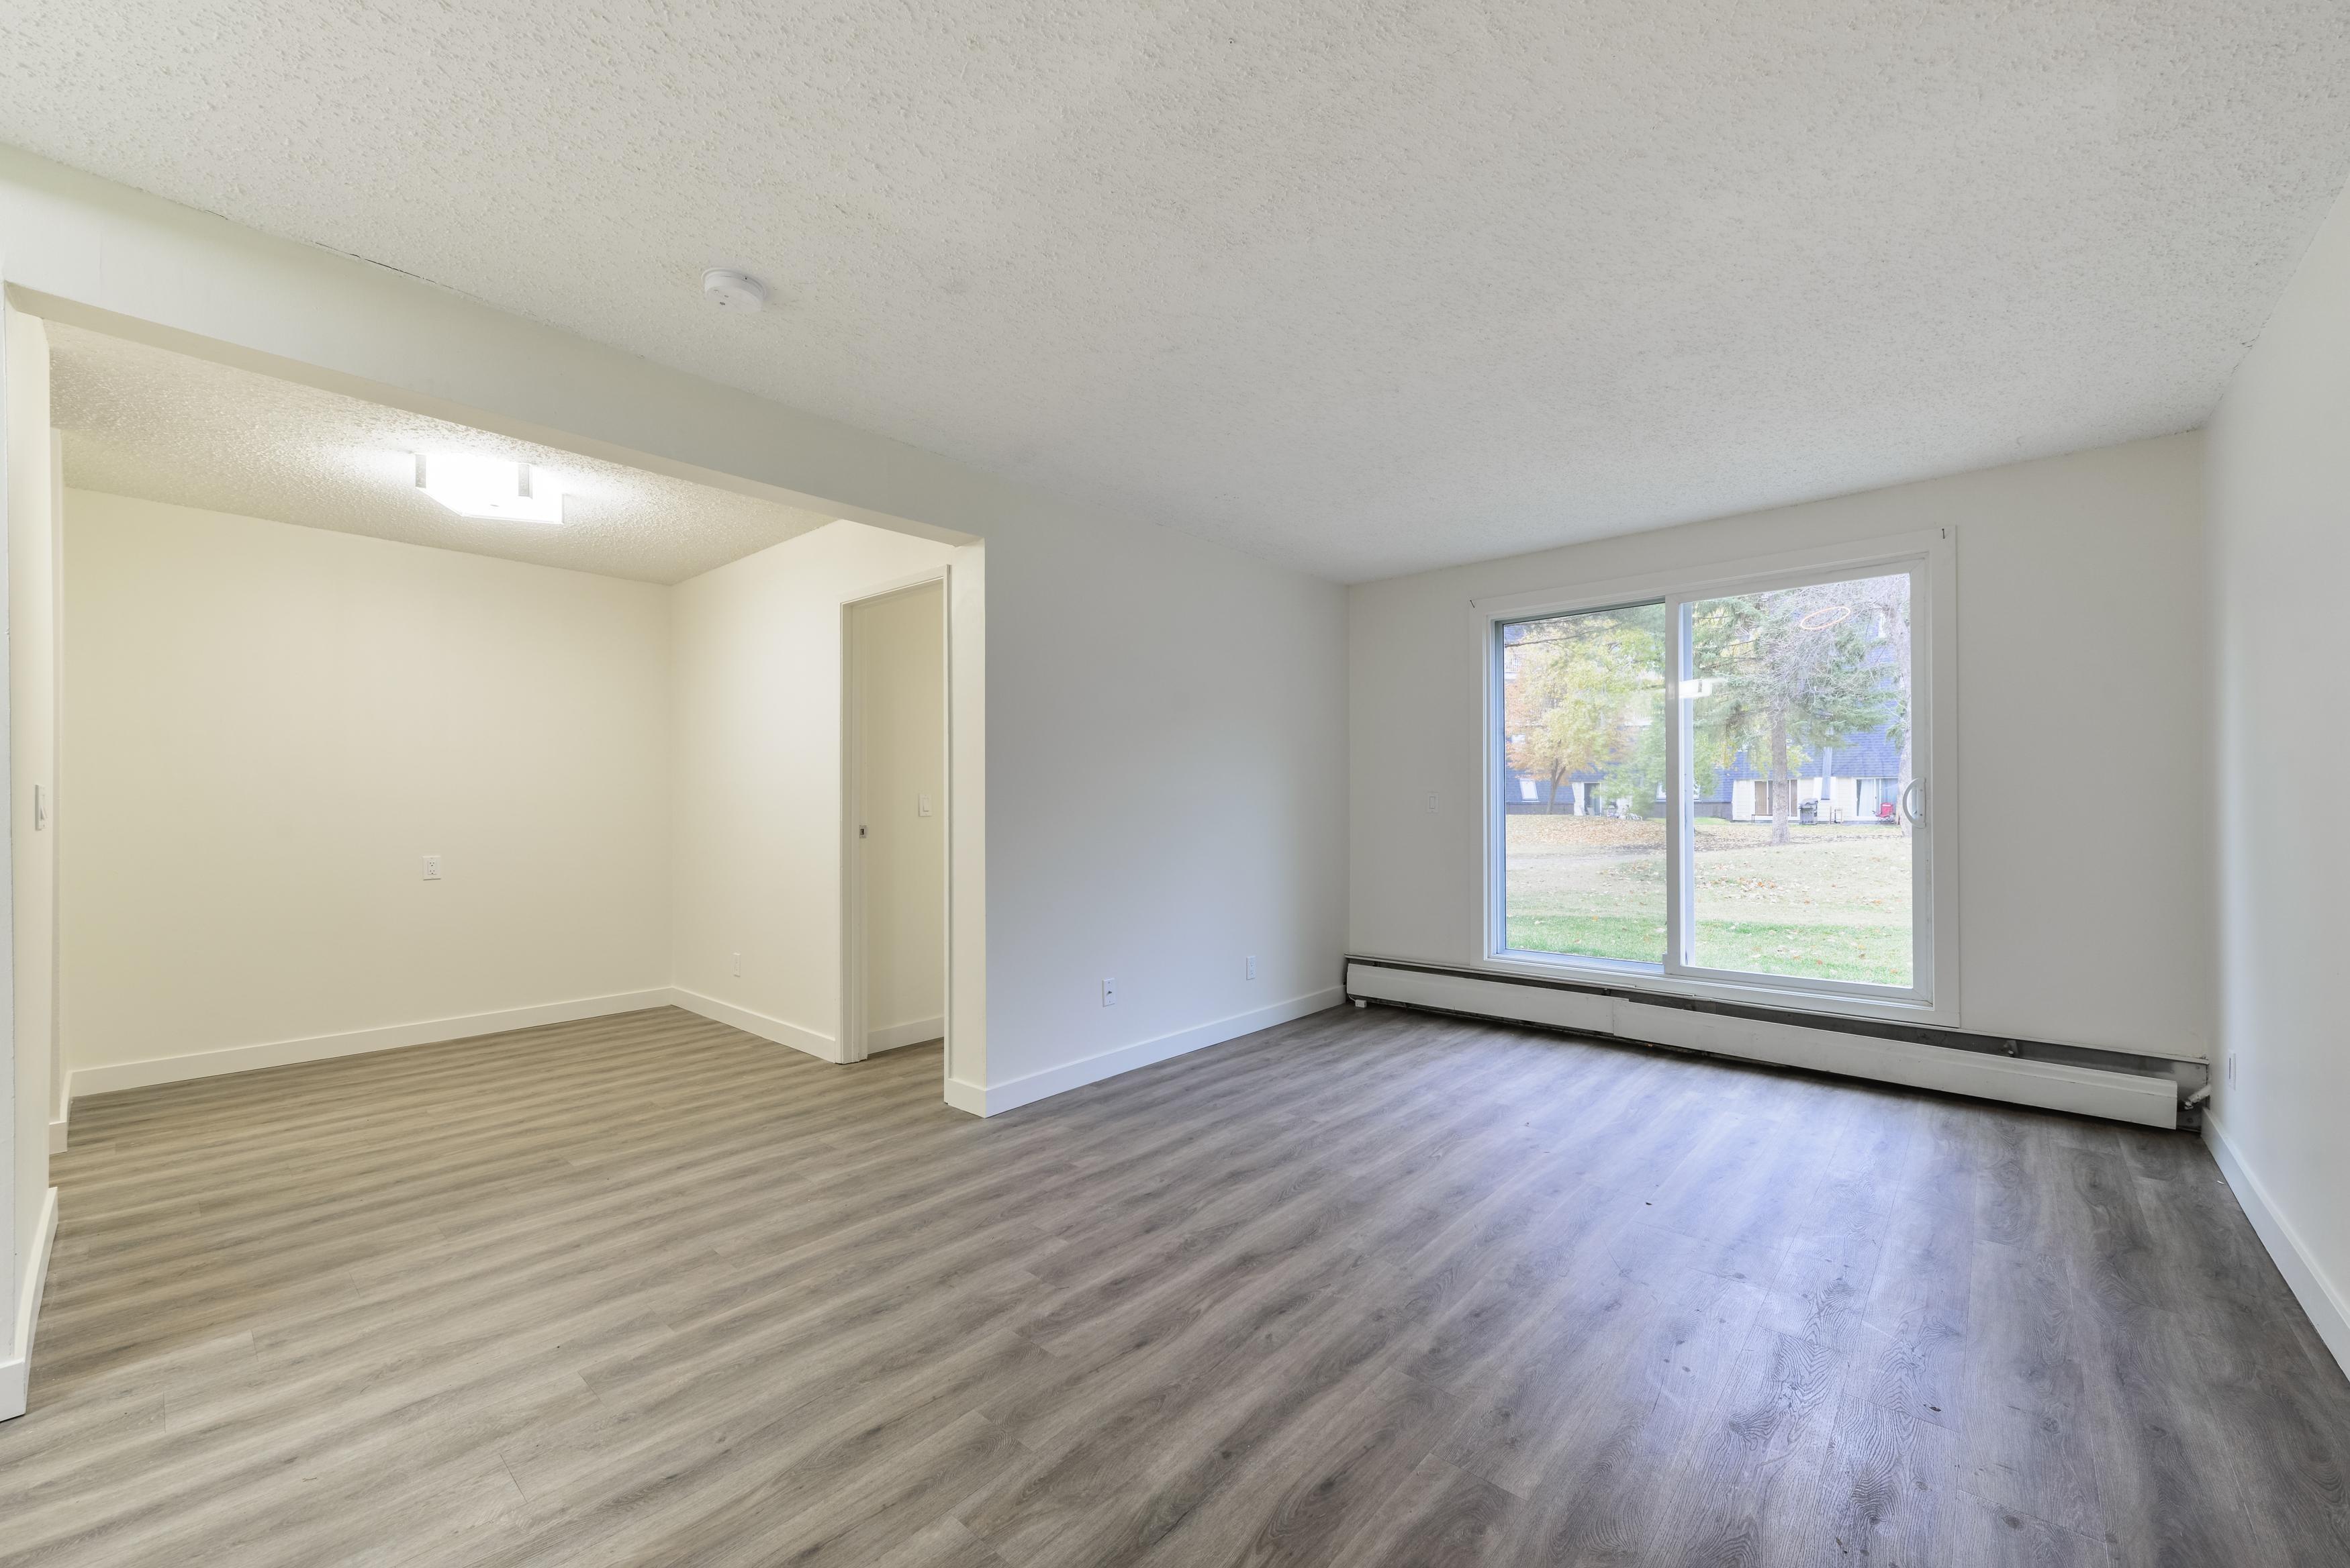 20 Broadview Crescent St Albert AB T8N 0B2 Apartment Rental